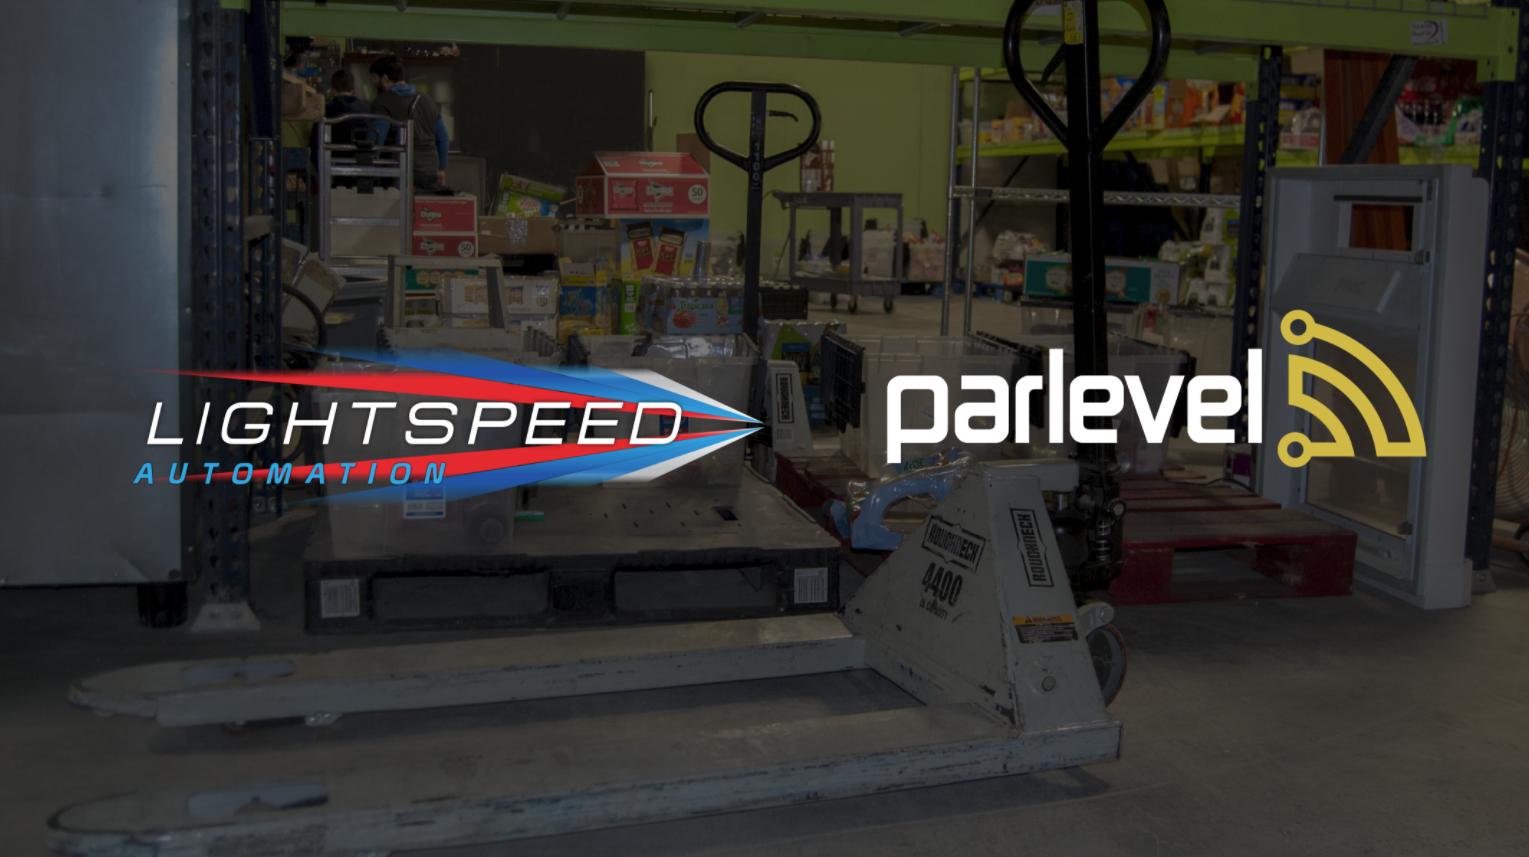 Parlevel x Lightspeed Integration